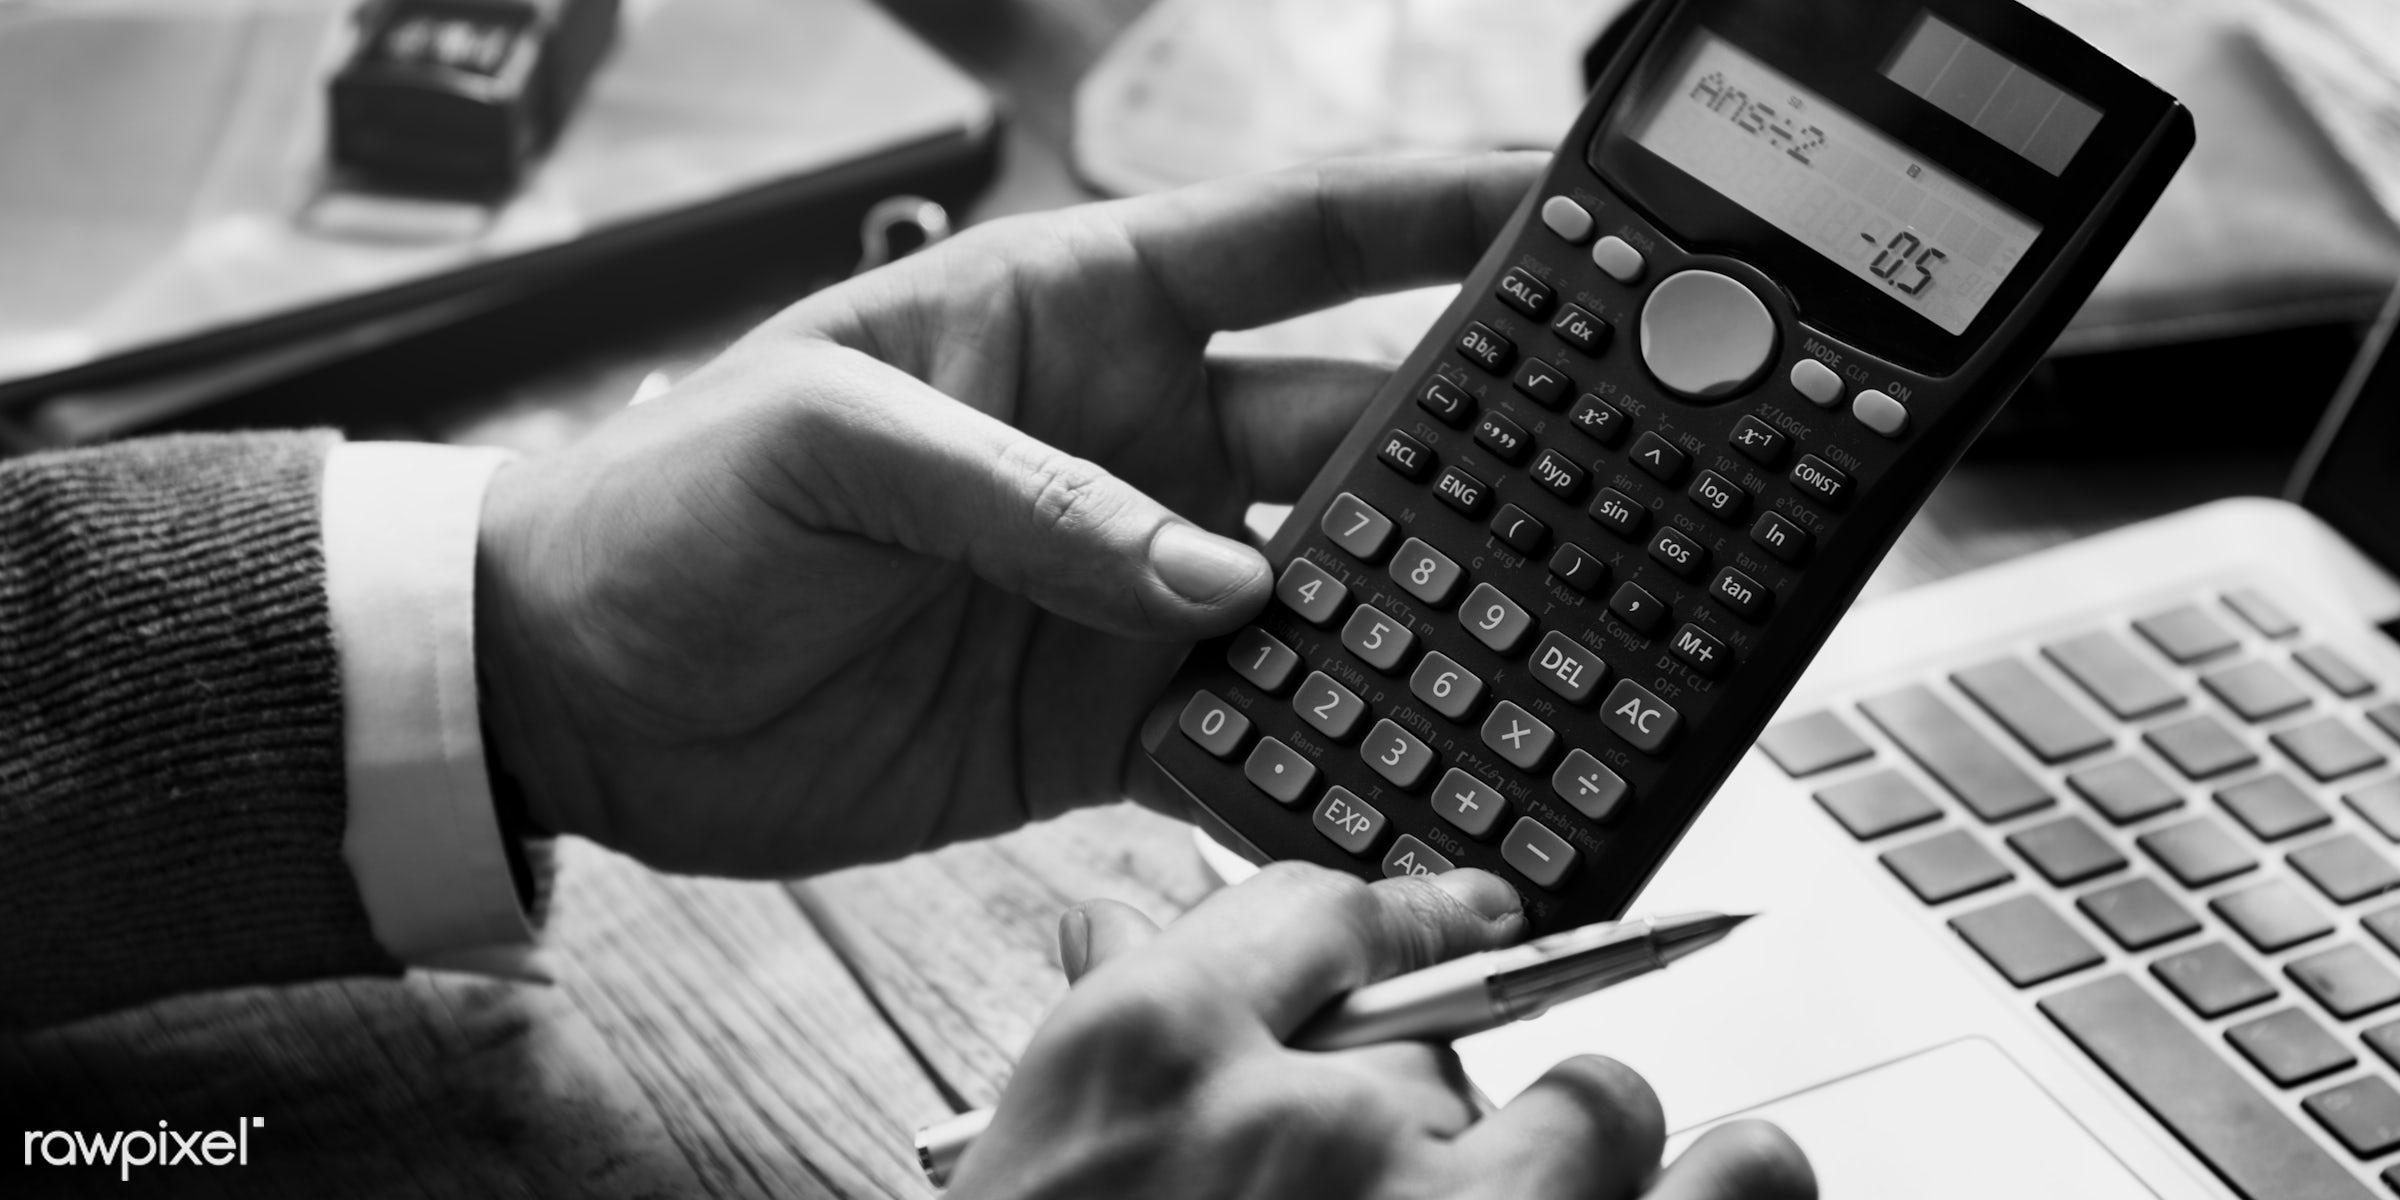 trading, accounting, agenda, benefit, bill, business, calculate, calculator, data, digital, document, economy, electronics,...